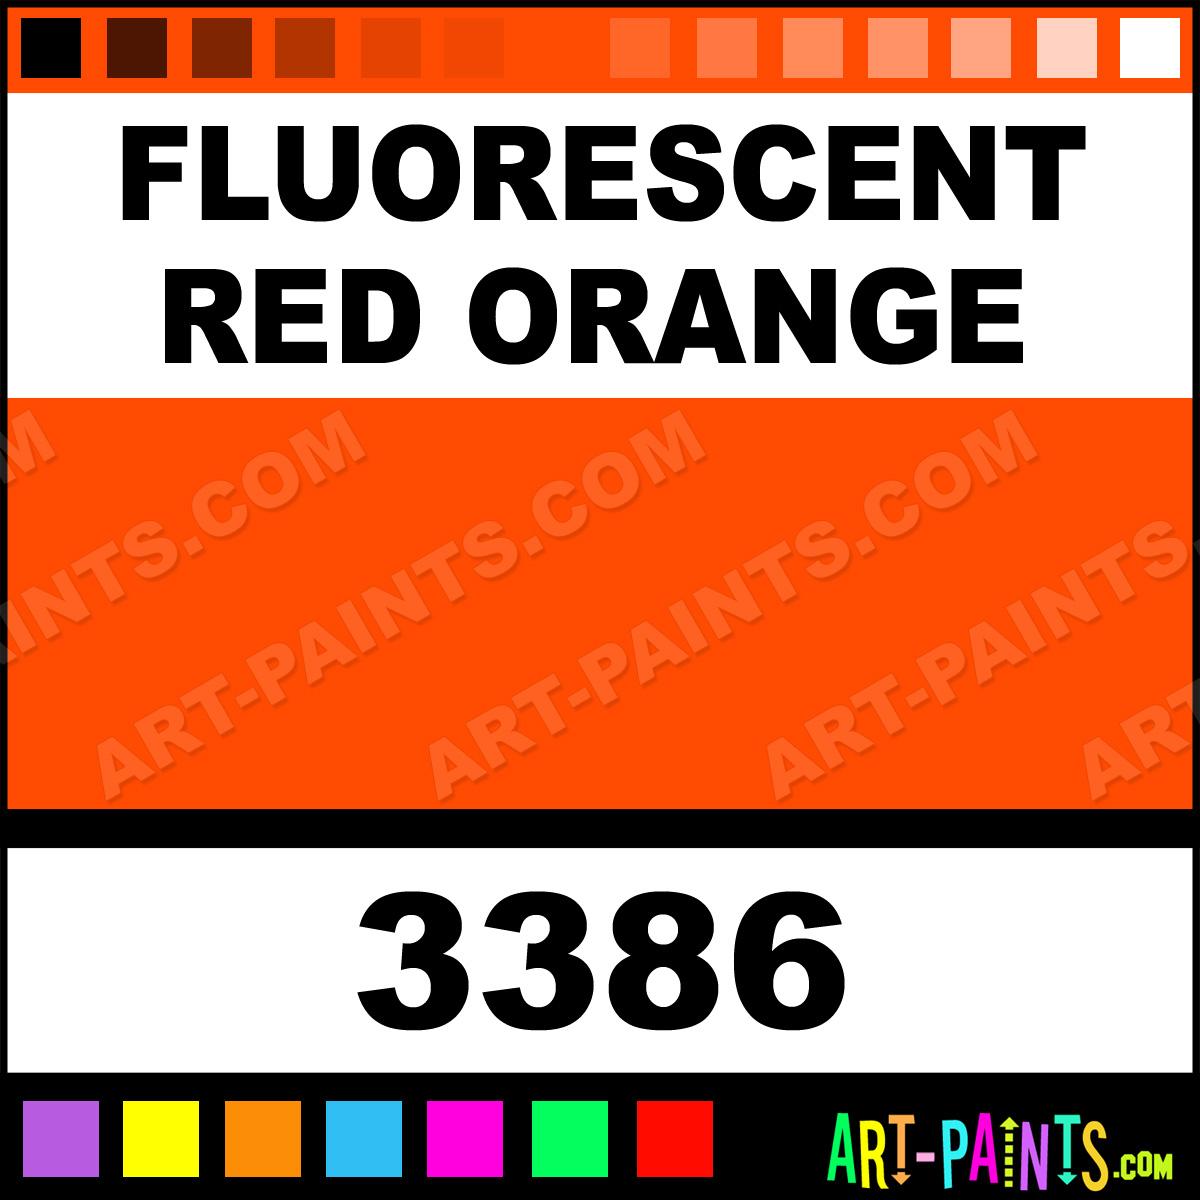 Fluorescent Red Orange Spray Enamel Paints 3386